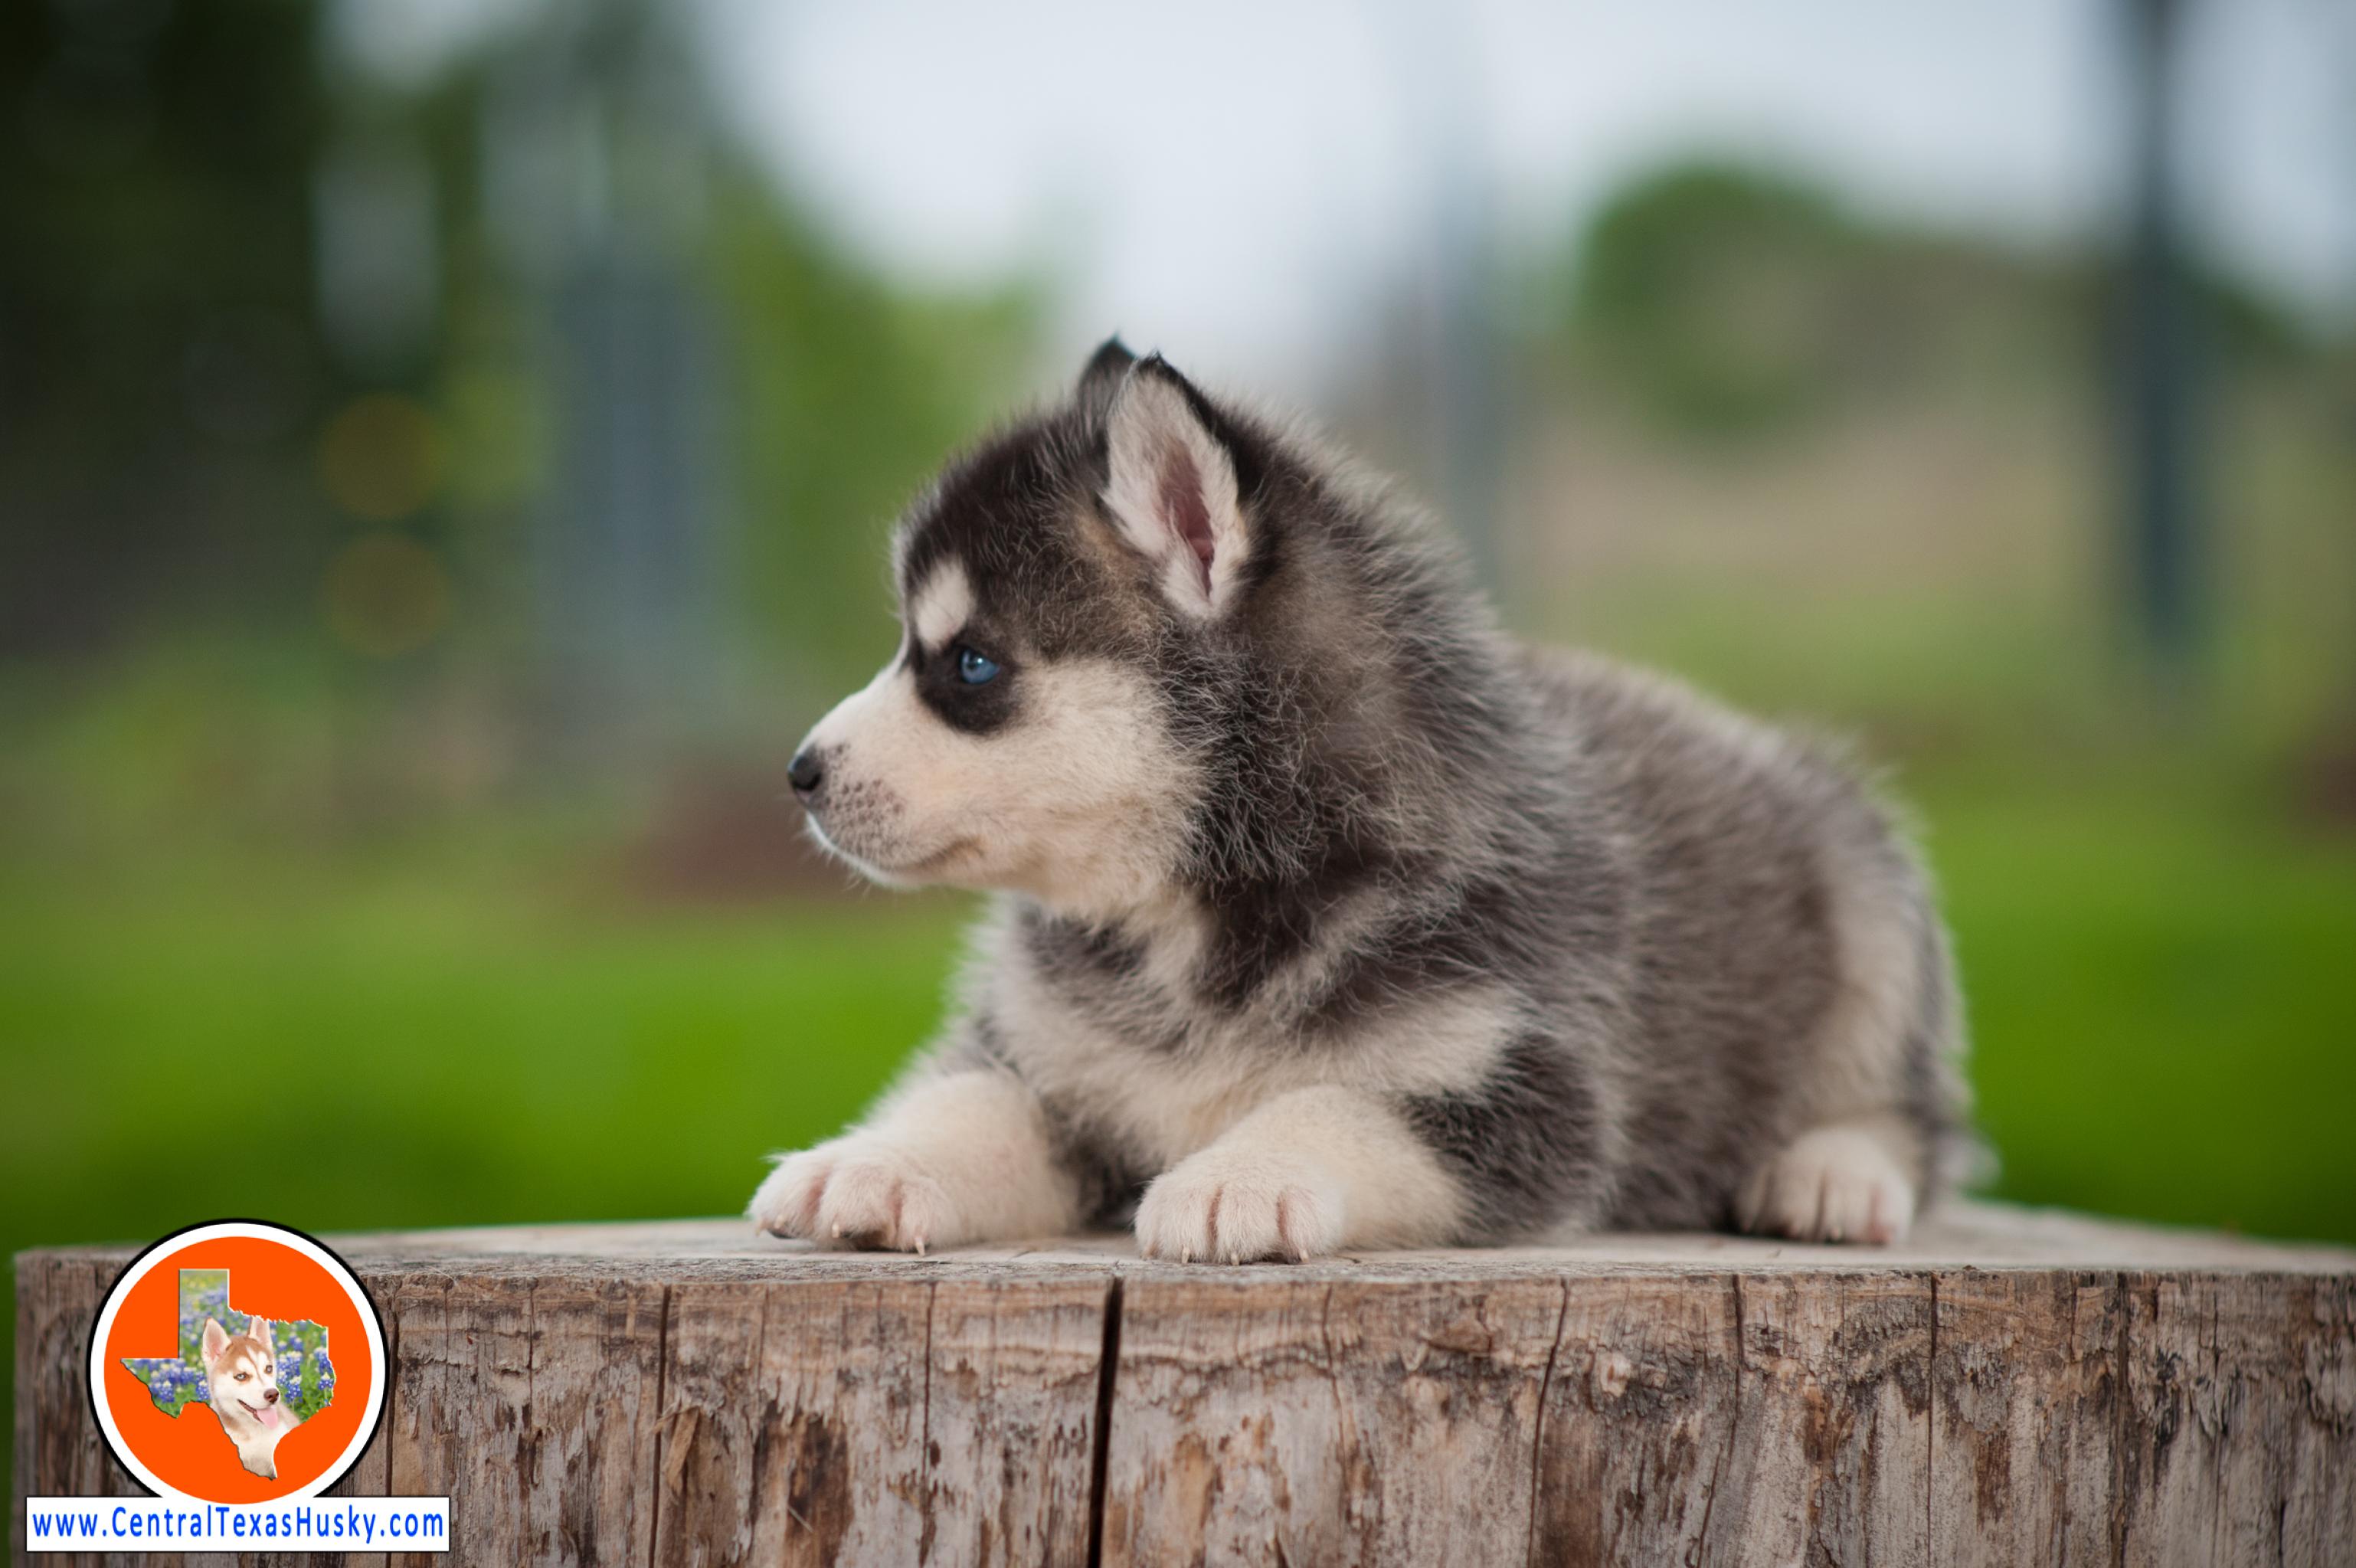 central-texas-husky_austin-siberian-husky-breeder_703971_20180324